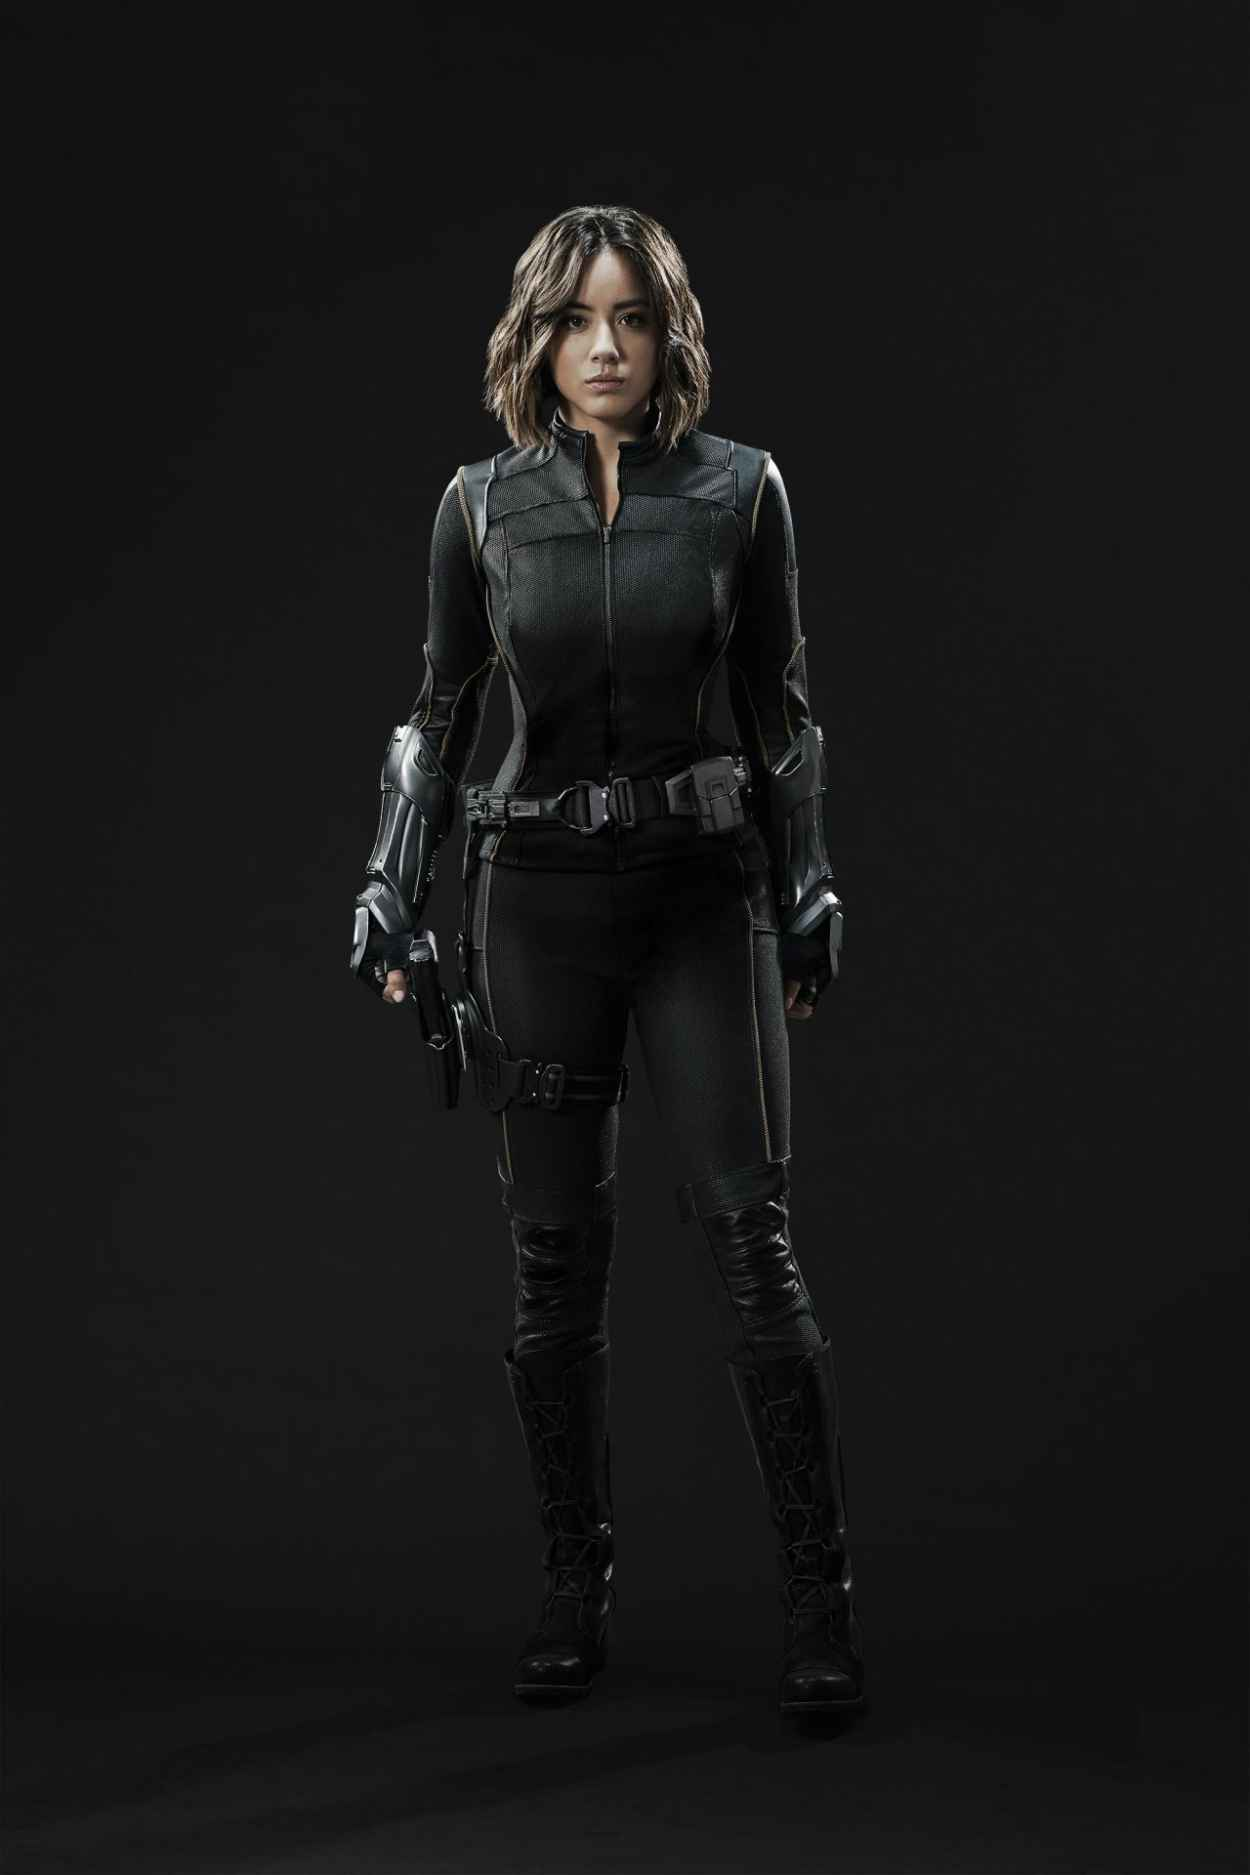 Chloe Bennet - Agents of SHIELD Season 3 Photos-3